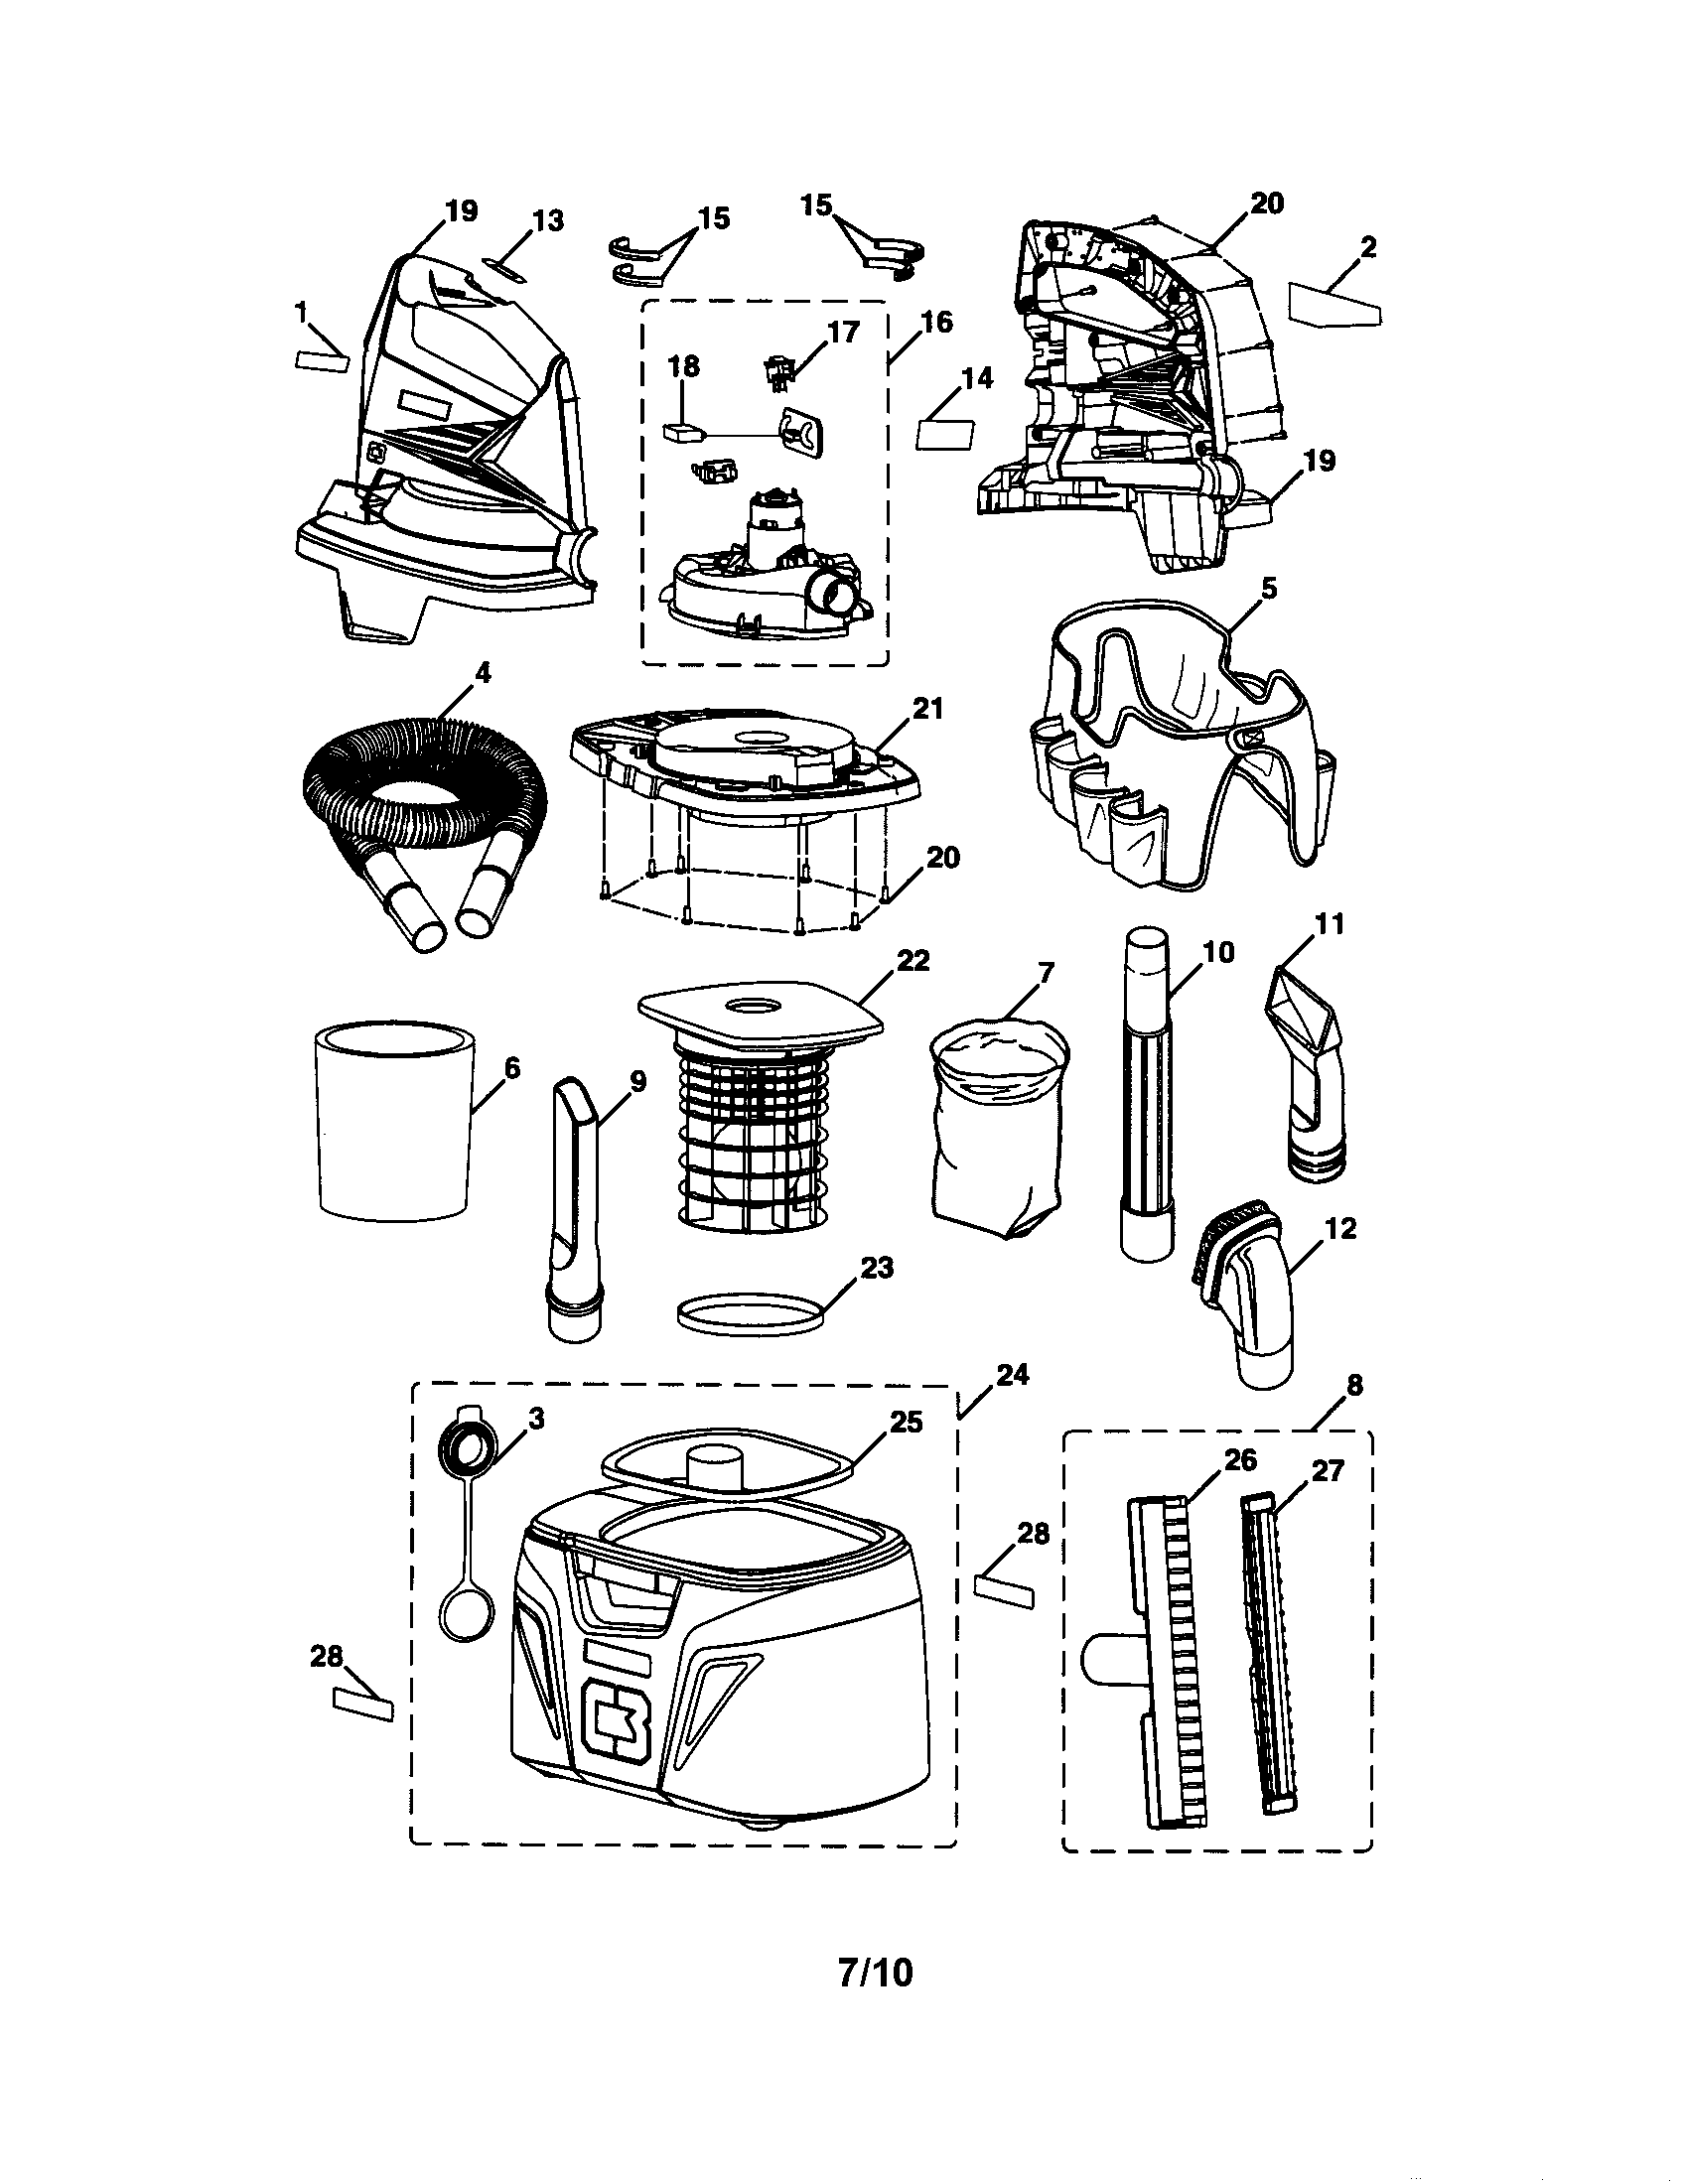 hight resolution of craftsman 315175980 shop vac diagram